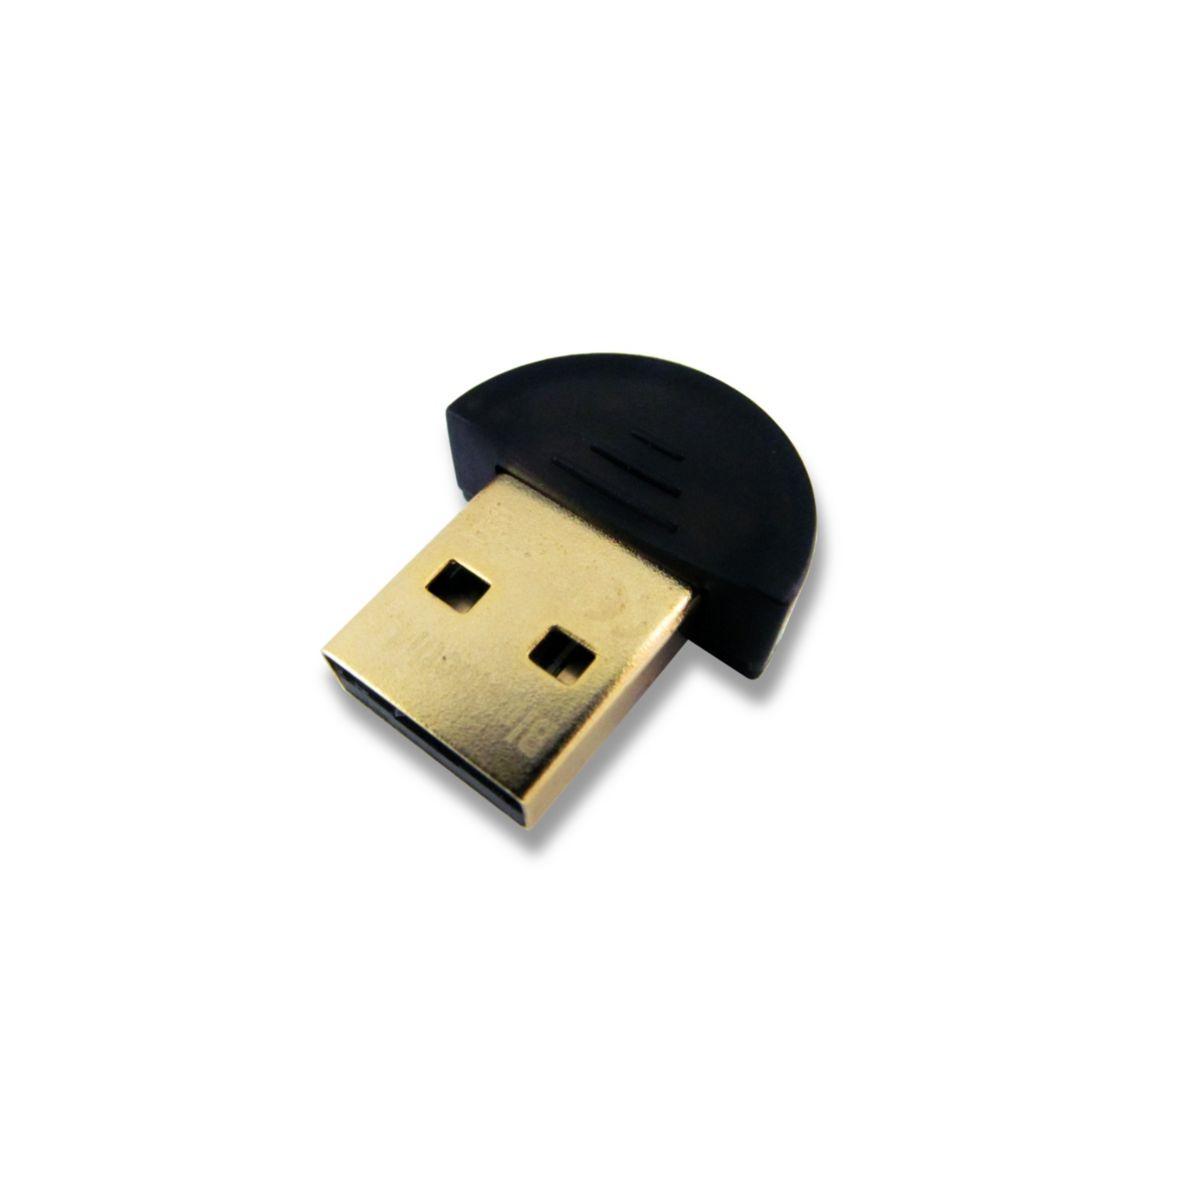 Adaptateur USB Bluetooth ESSENTIELB 4.0 10m (photo)